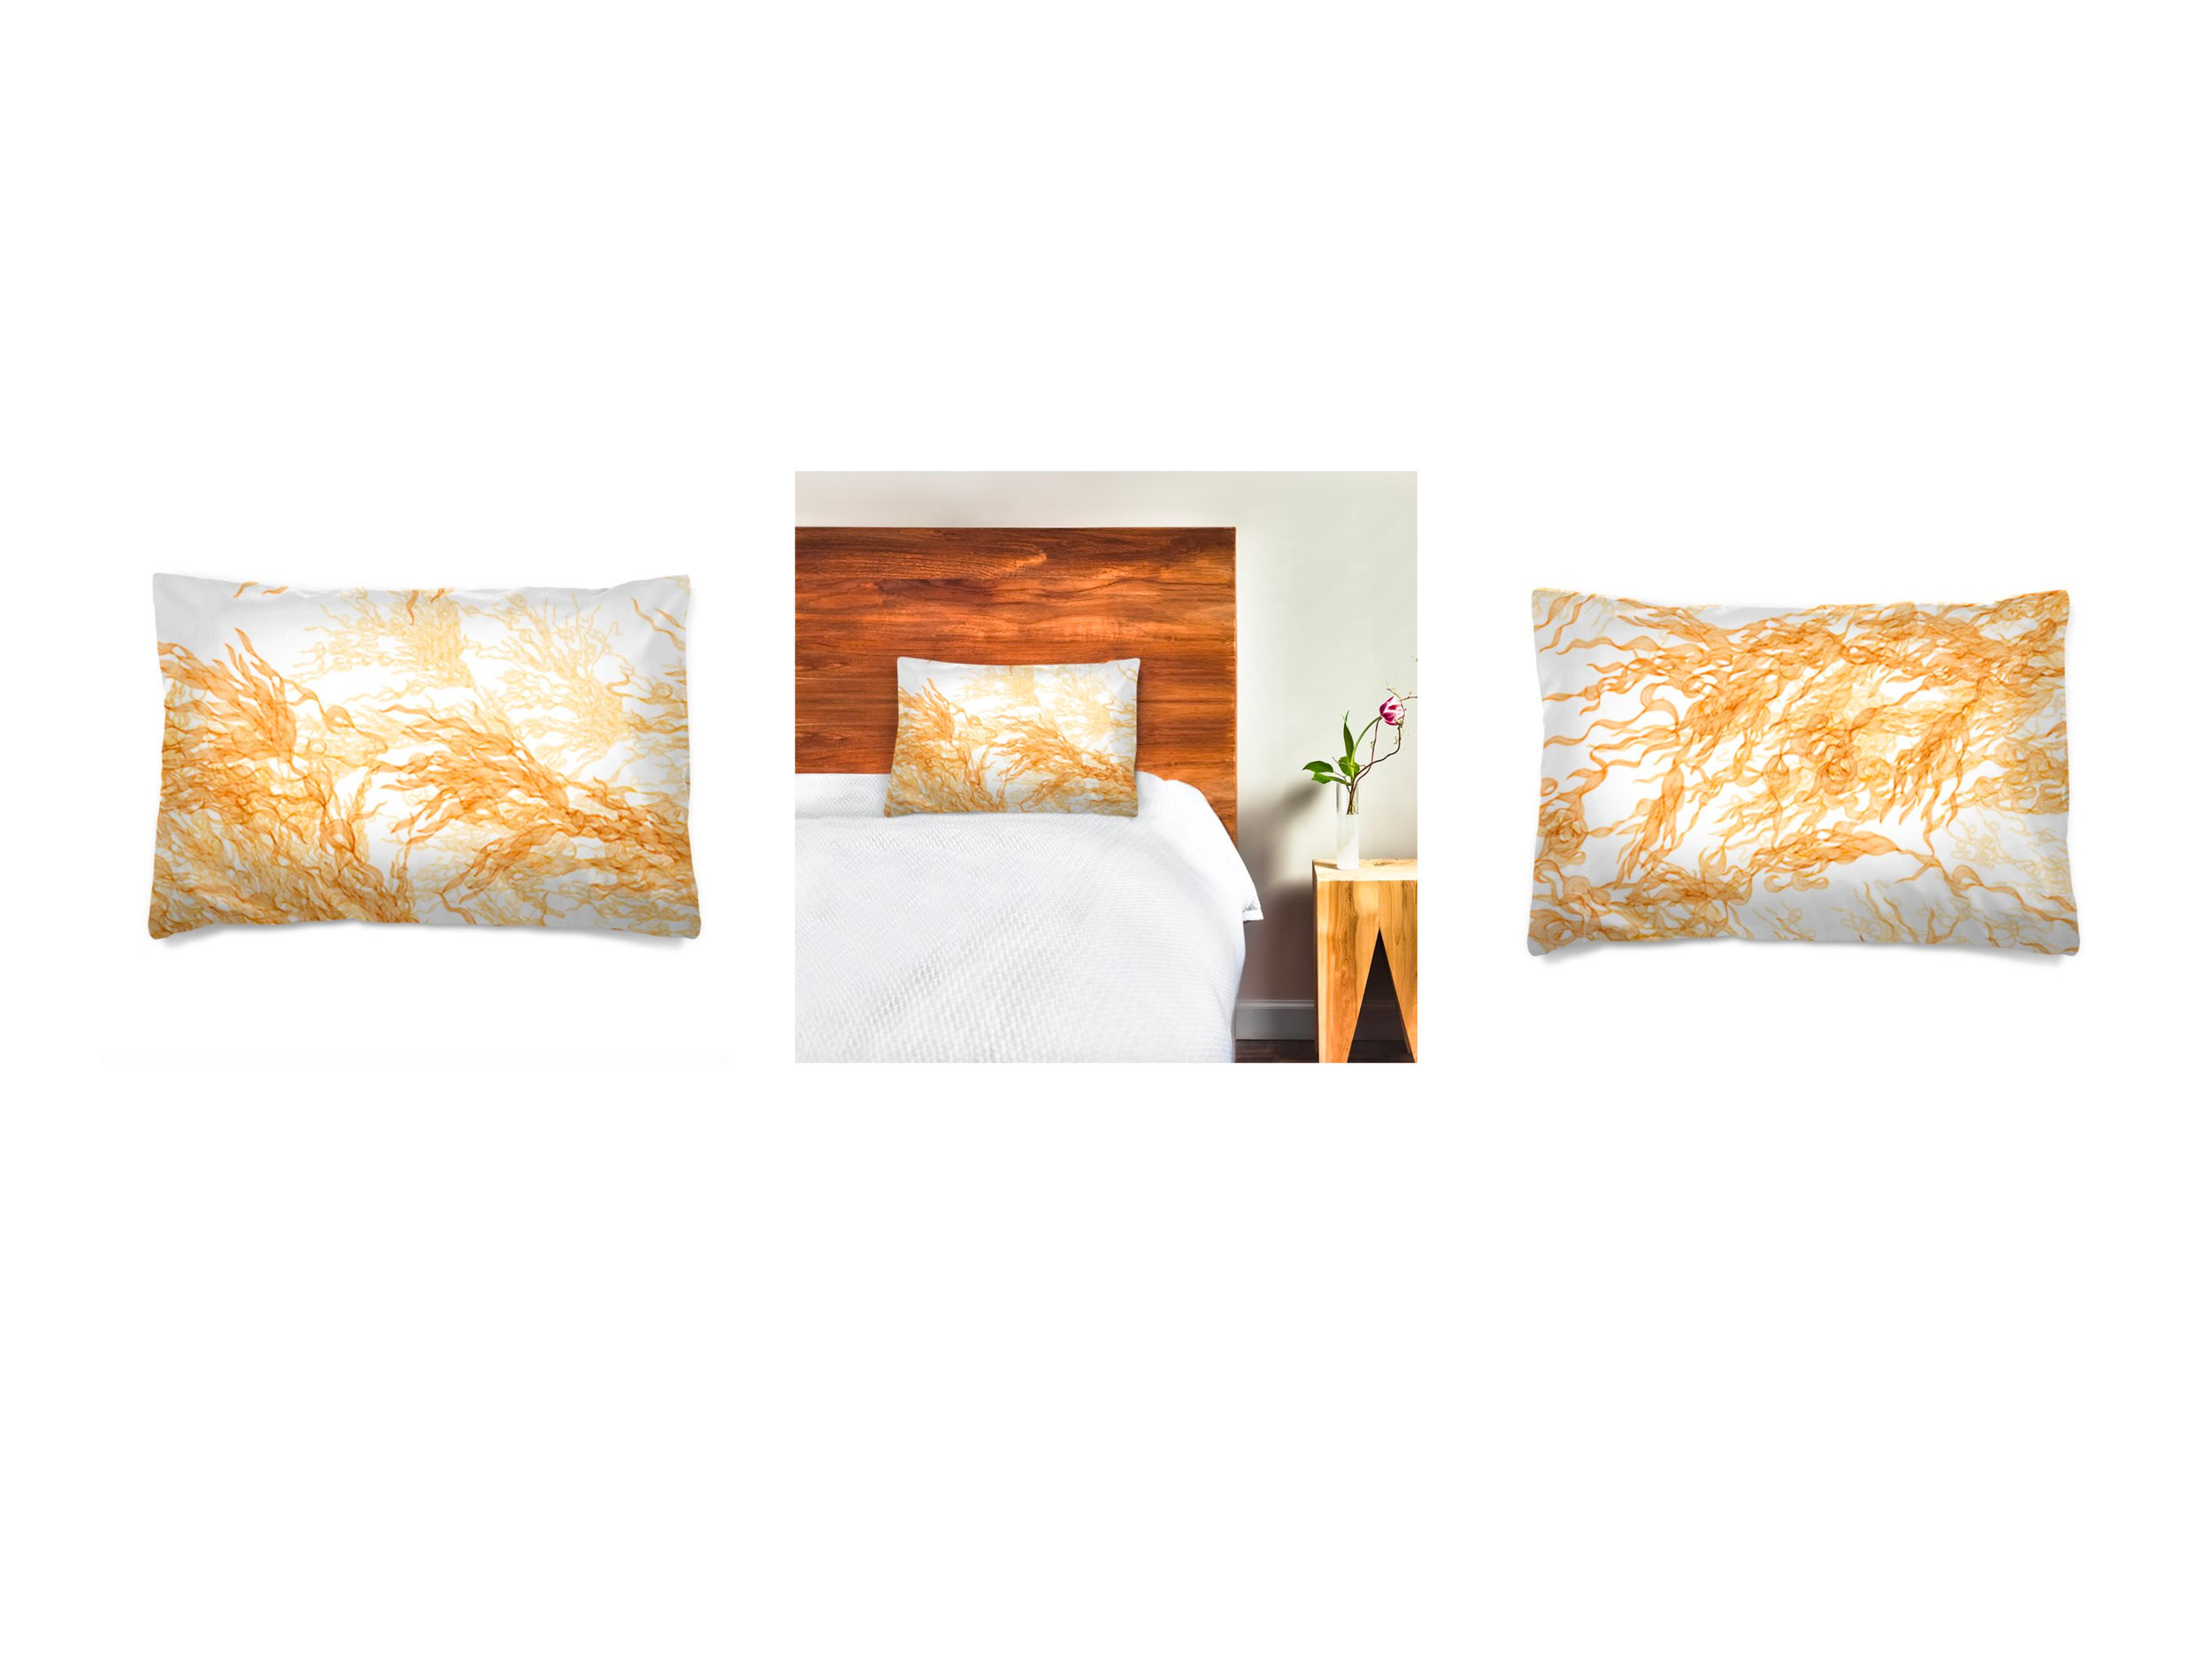 Flossie_Pillowcase_Gold Motif_Front&Back